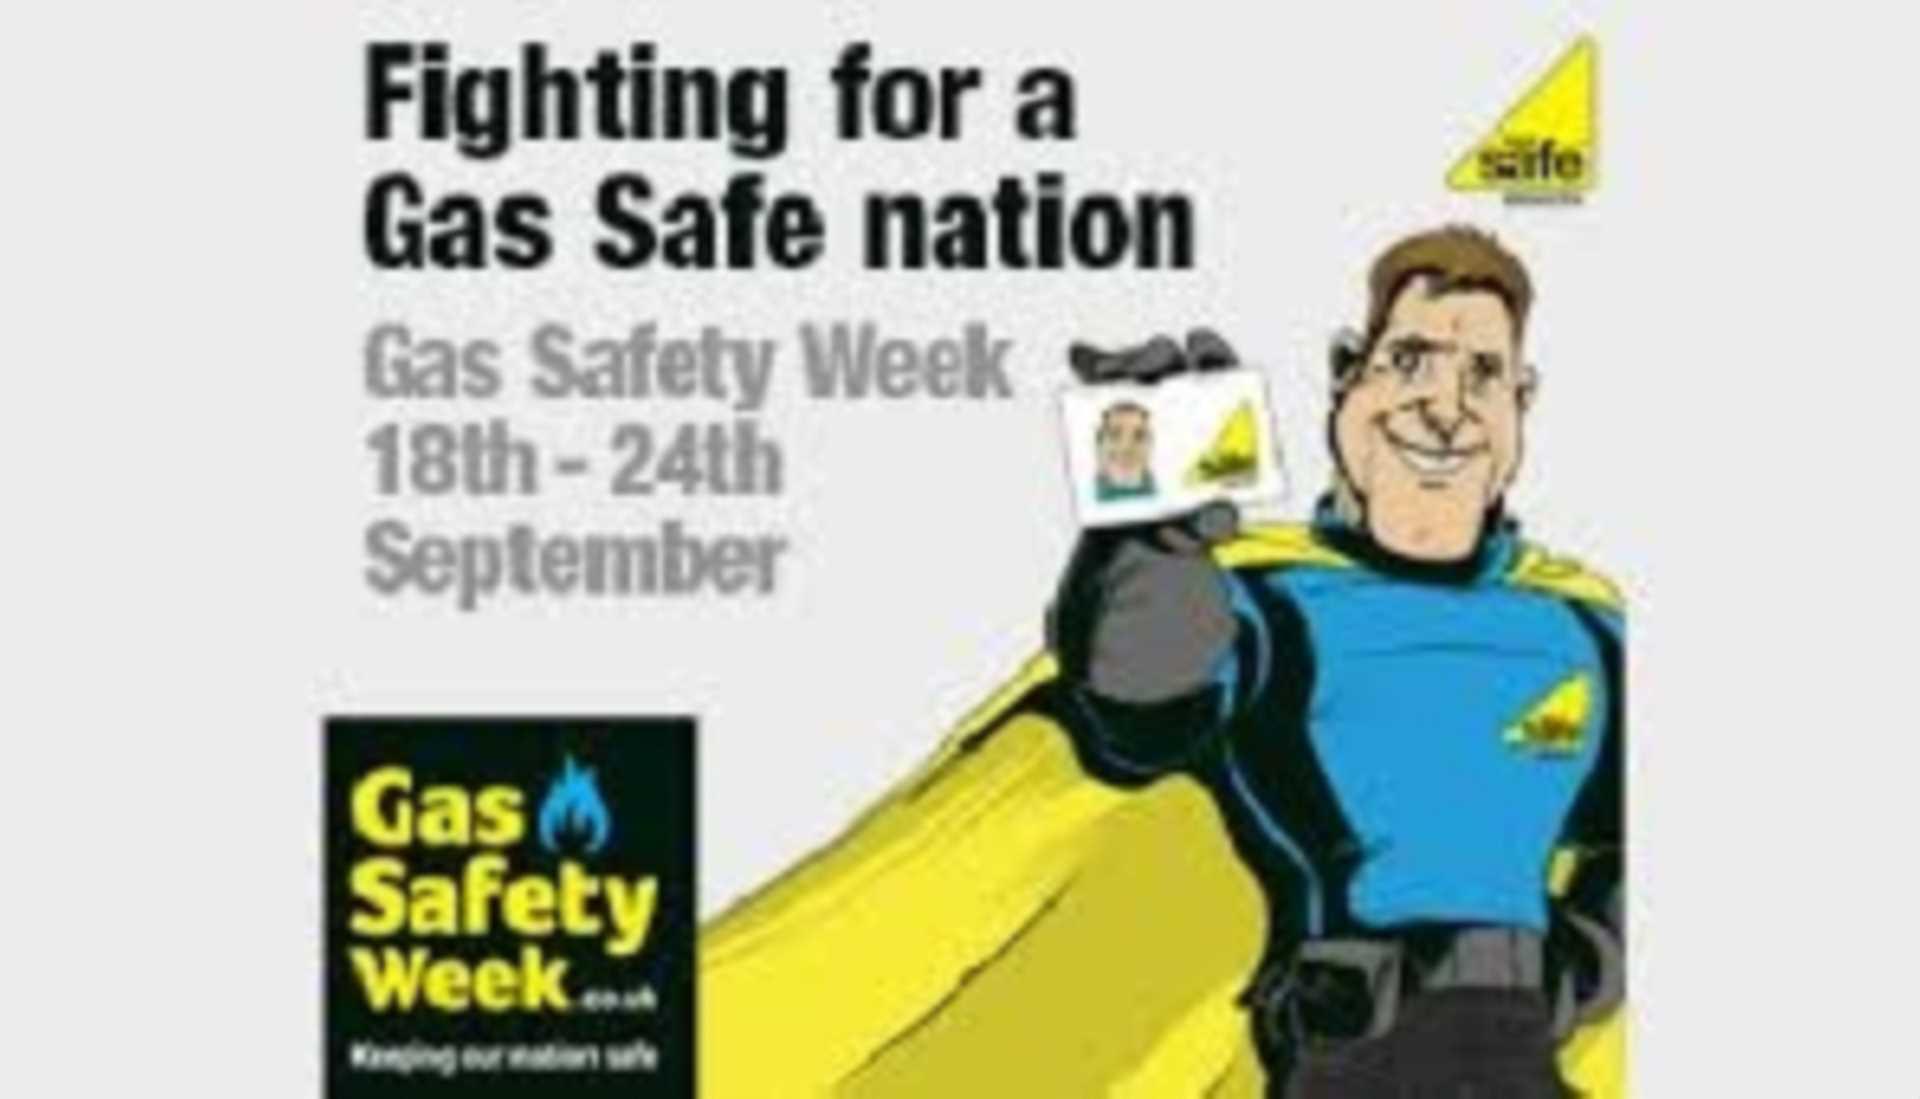 Gas Safe Week 18 to 24 September 2017